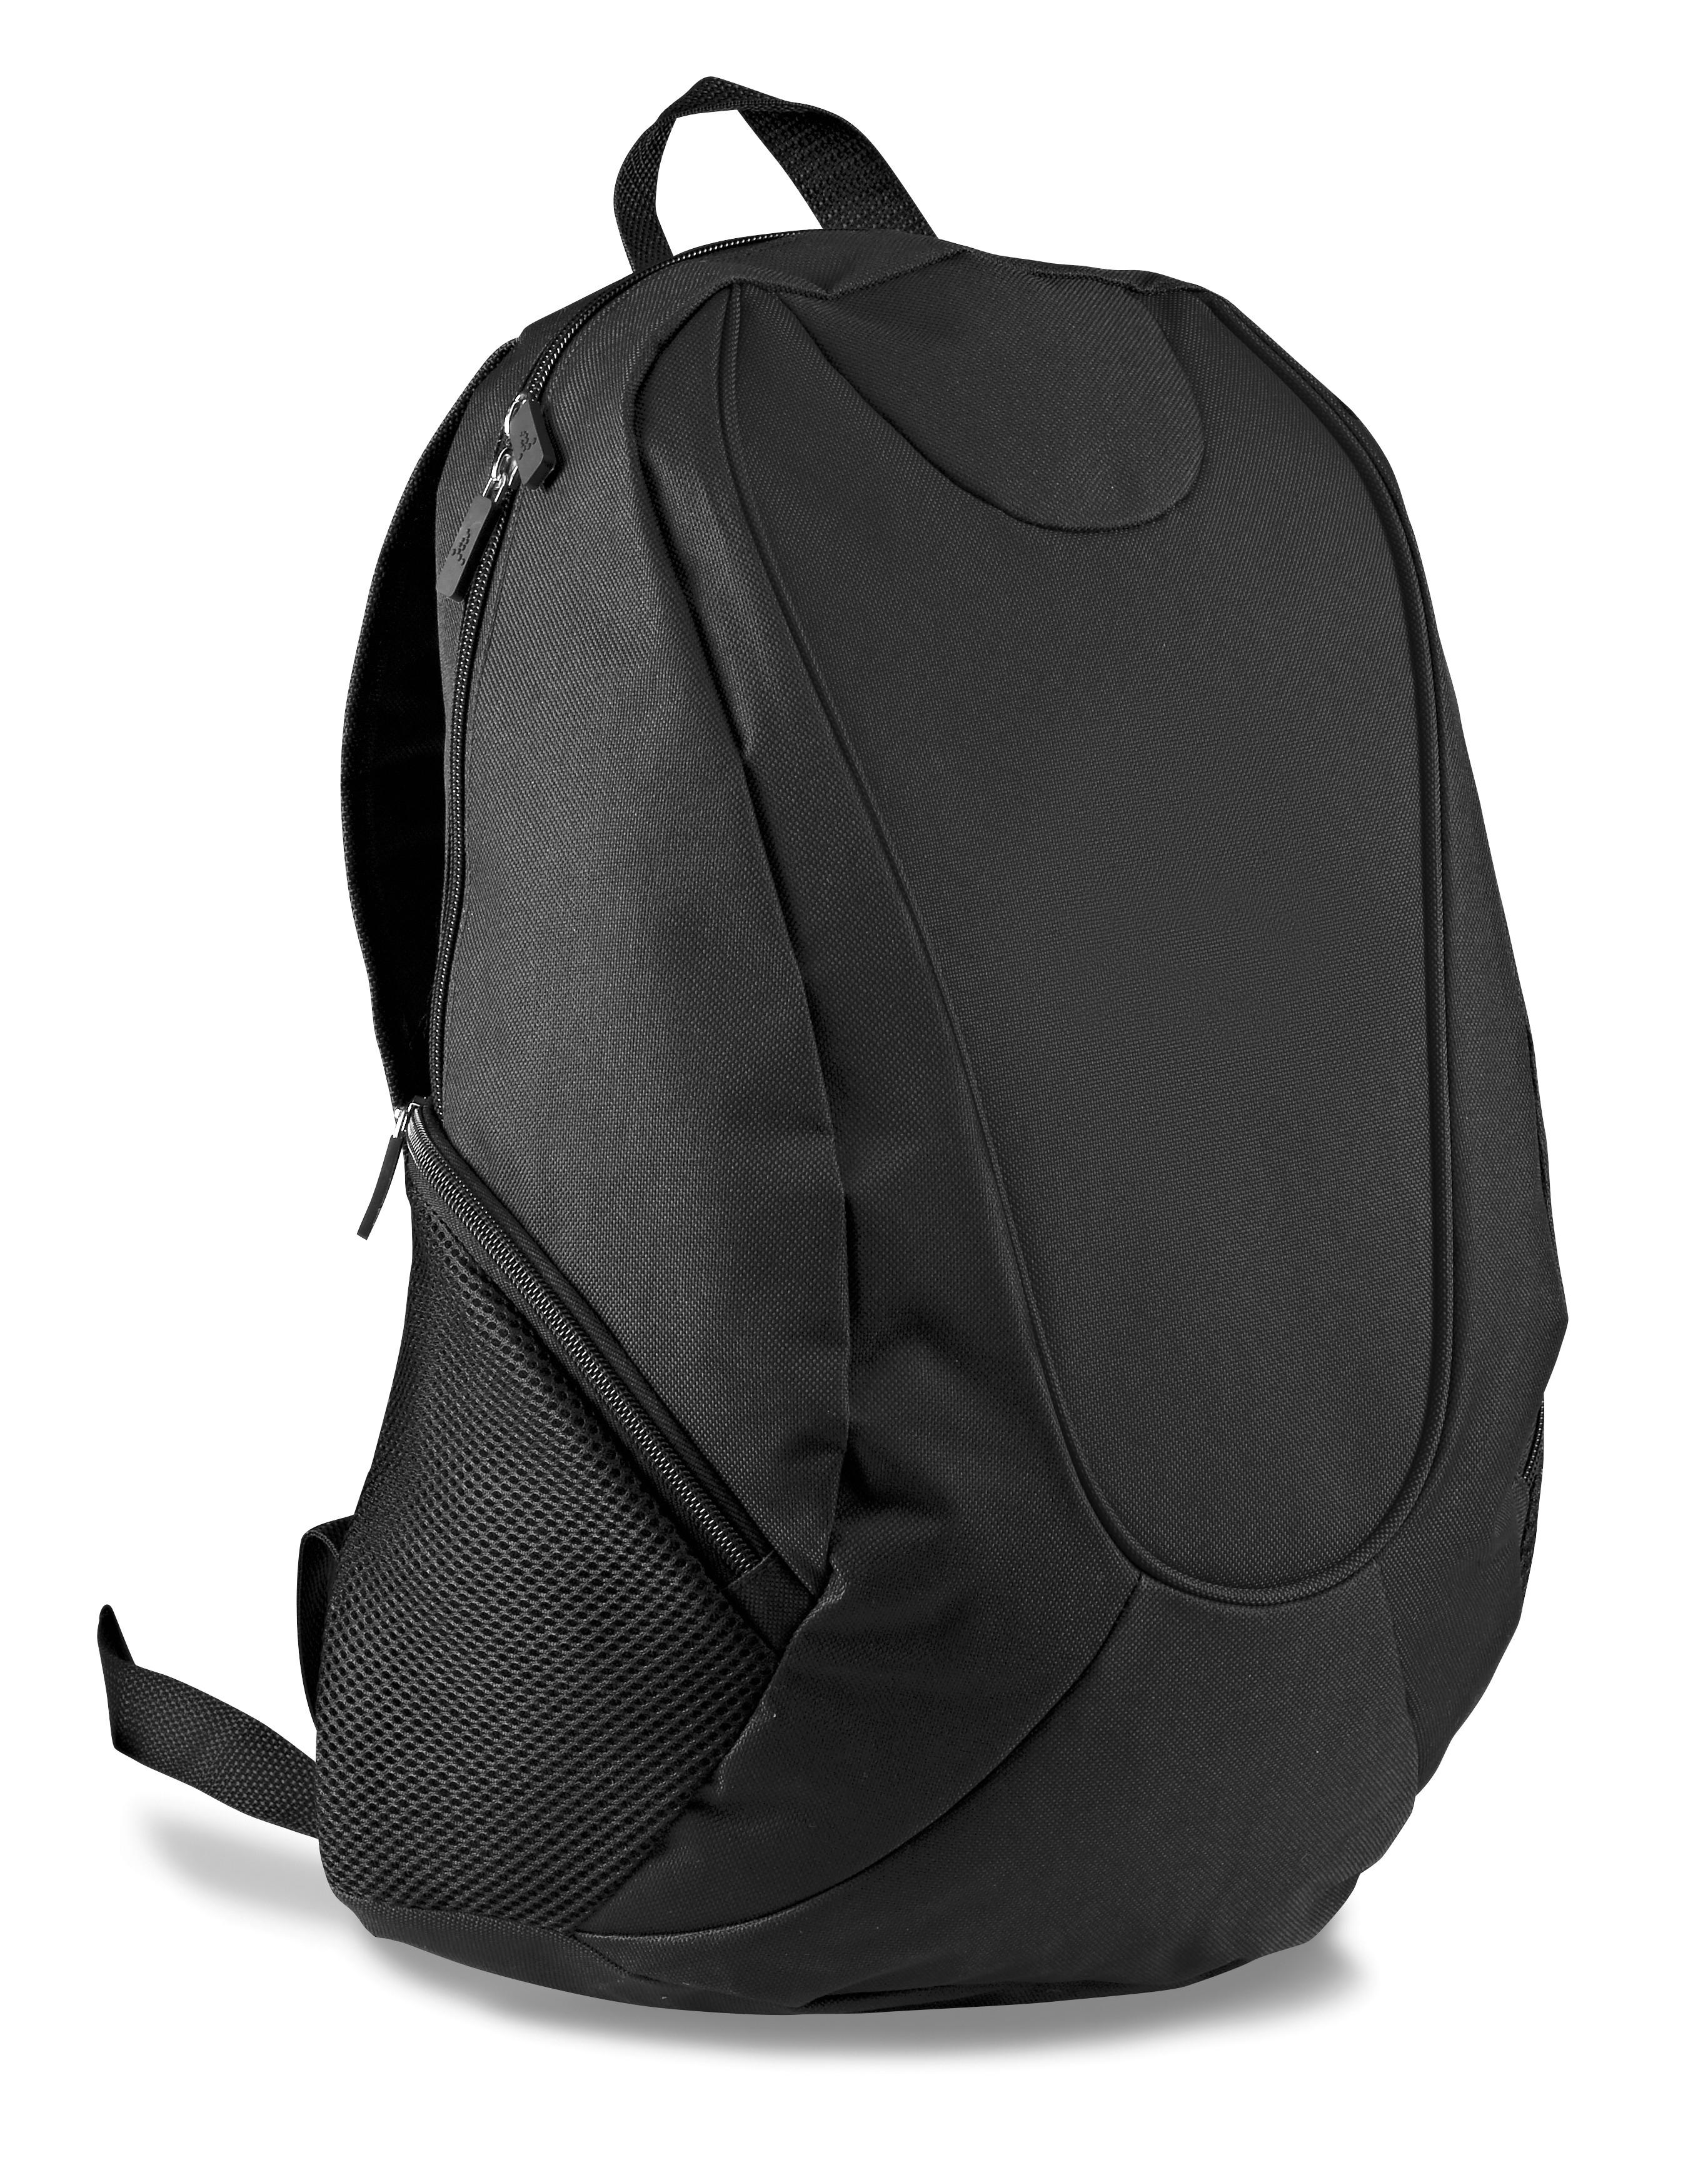 Nevada Bag